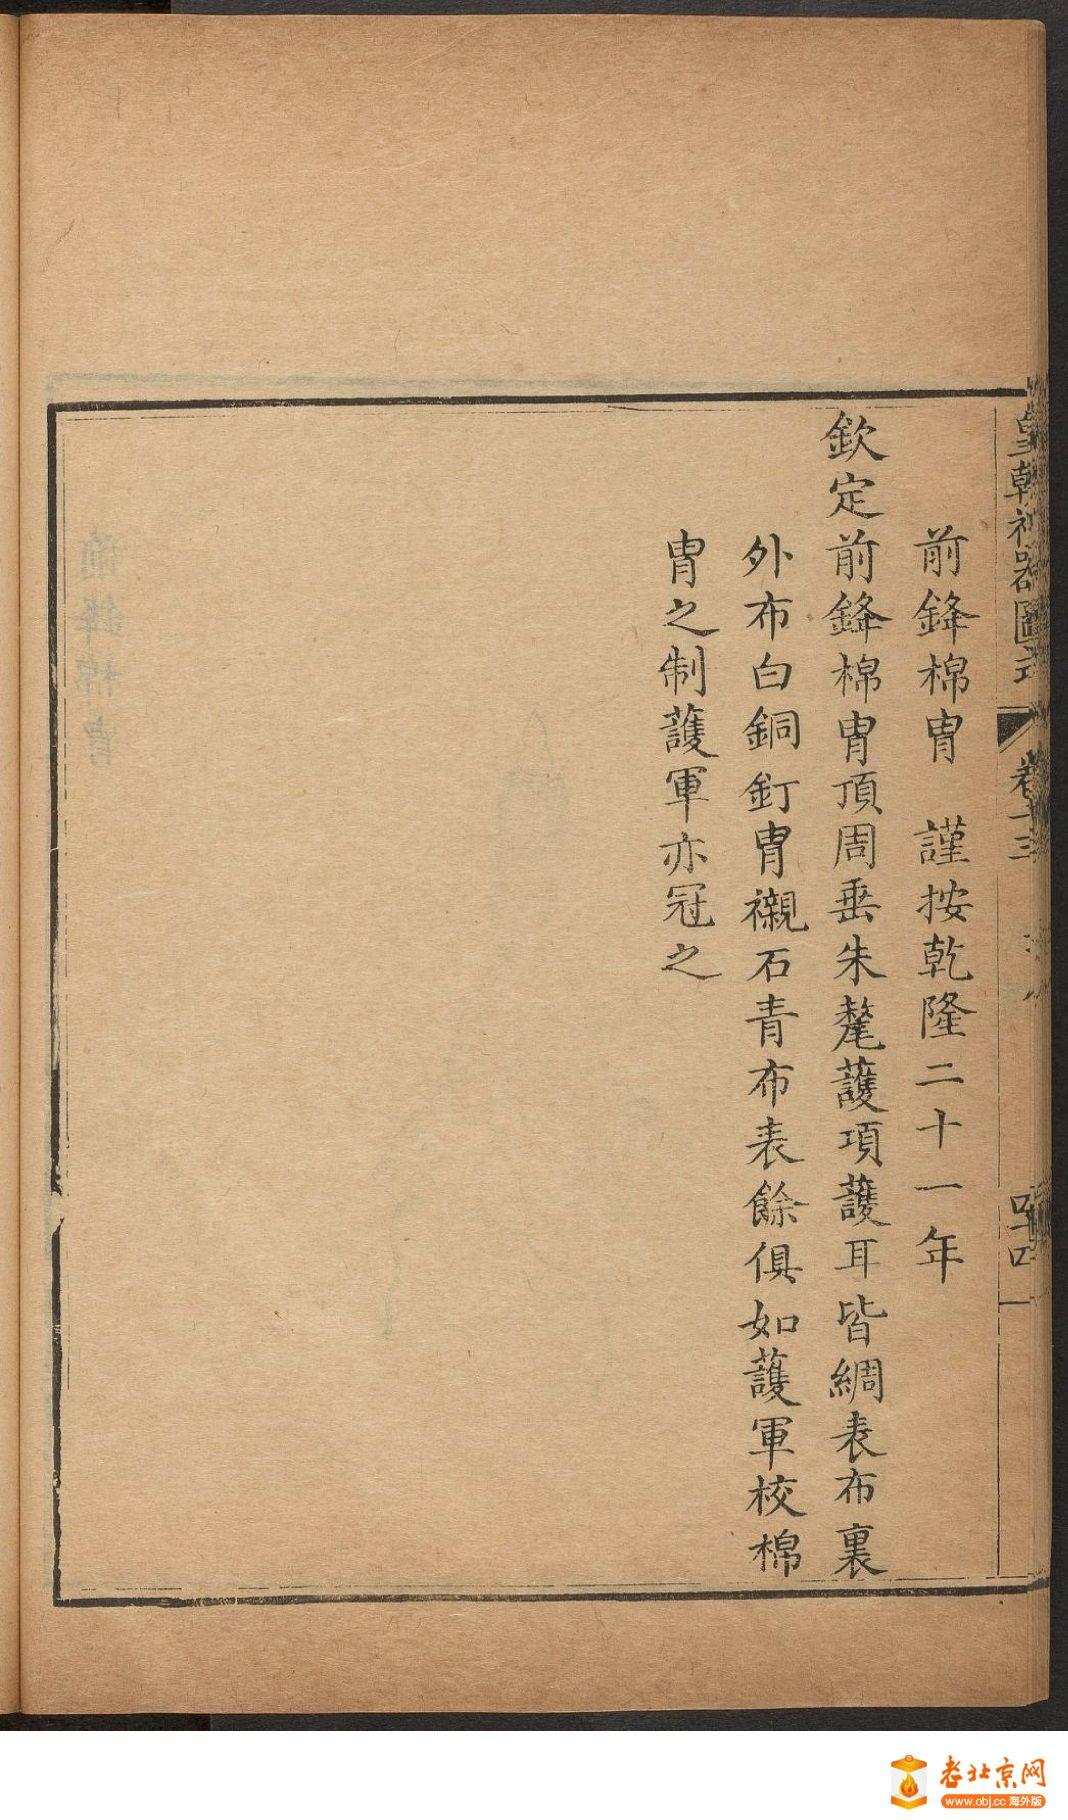 5_page5_image1b.jpg